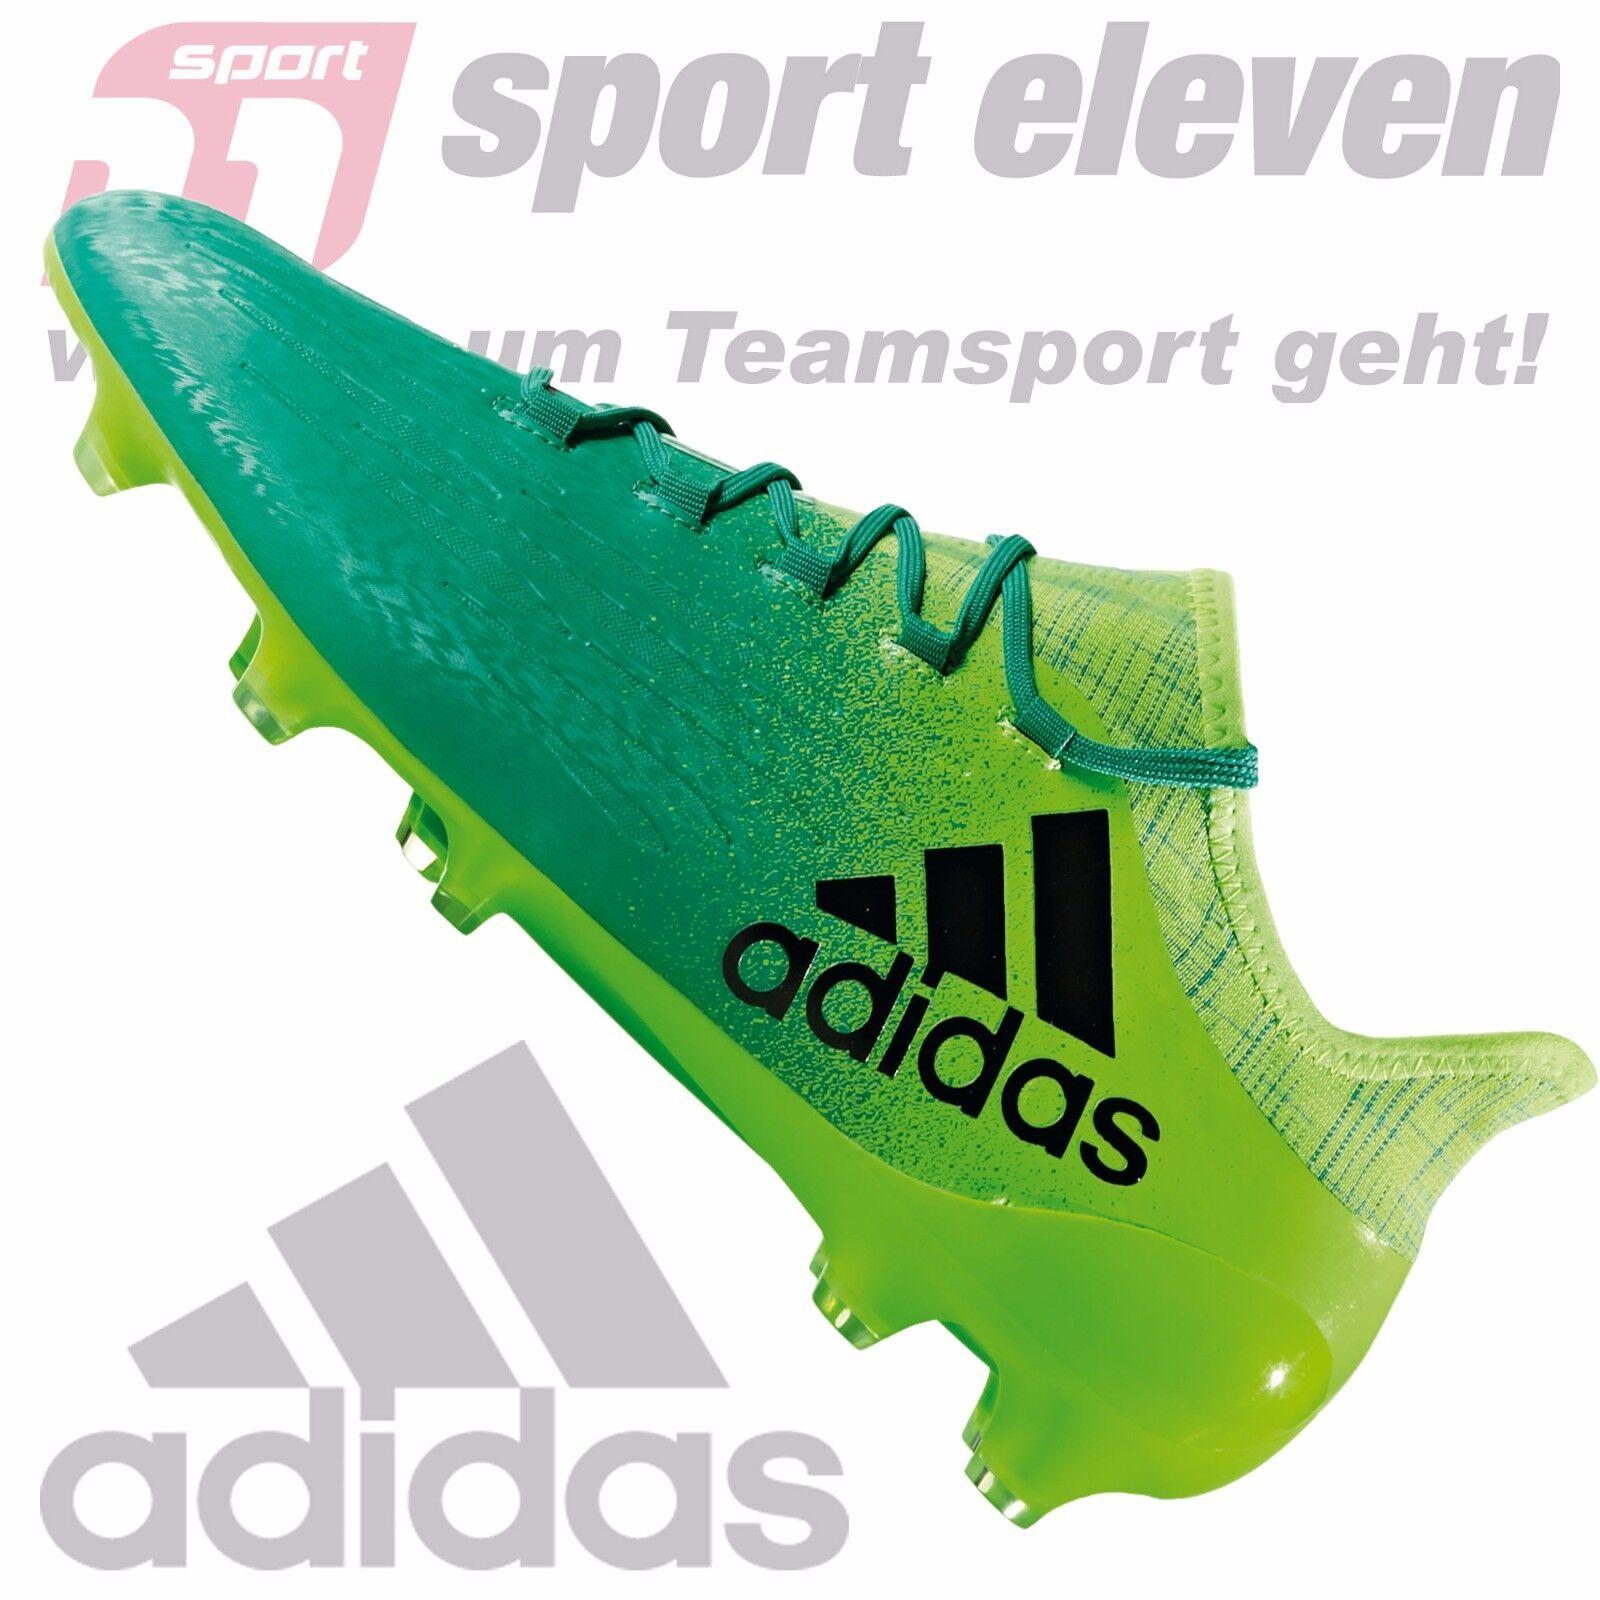 Adidas Fußballschuhe X X X 16.2 FG grün türkis schwarz - BB5850 ed53bd